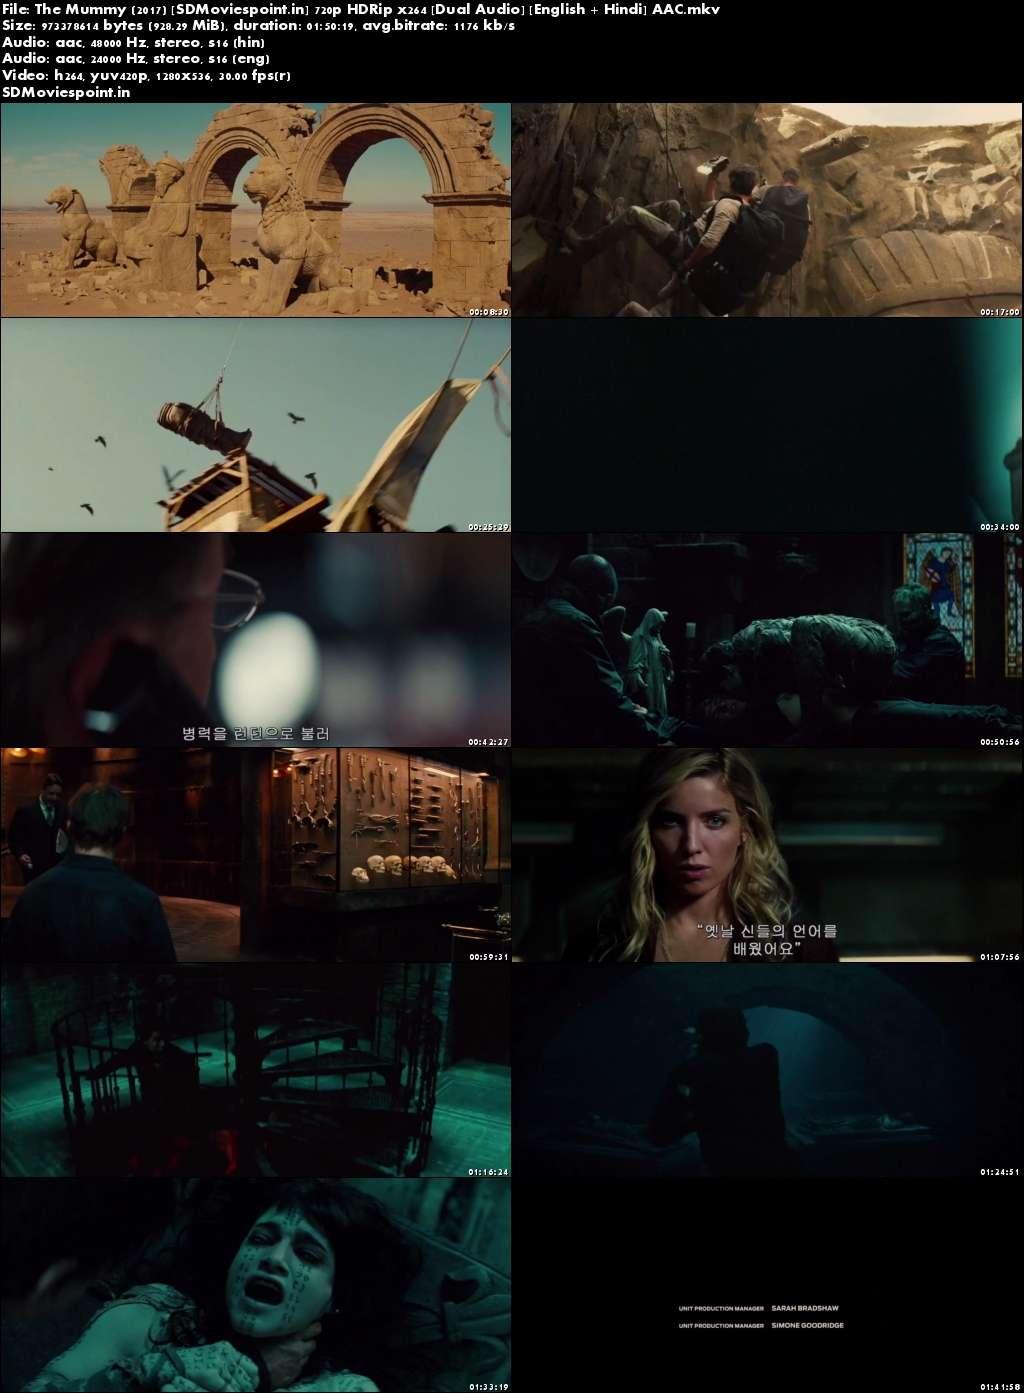 Screen Shot The Mummy (2017) Full Hindi Movie Download HD Dual Audio